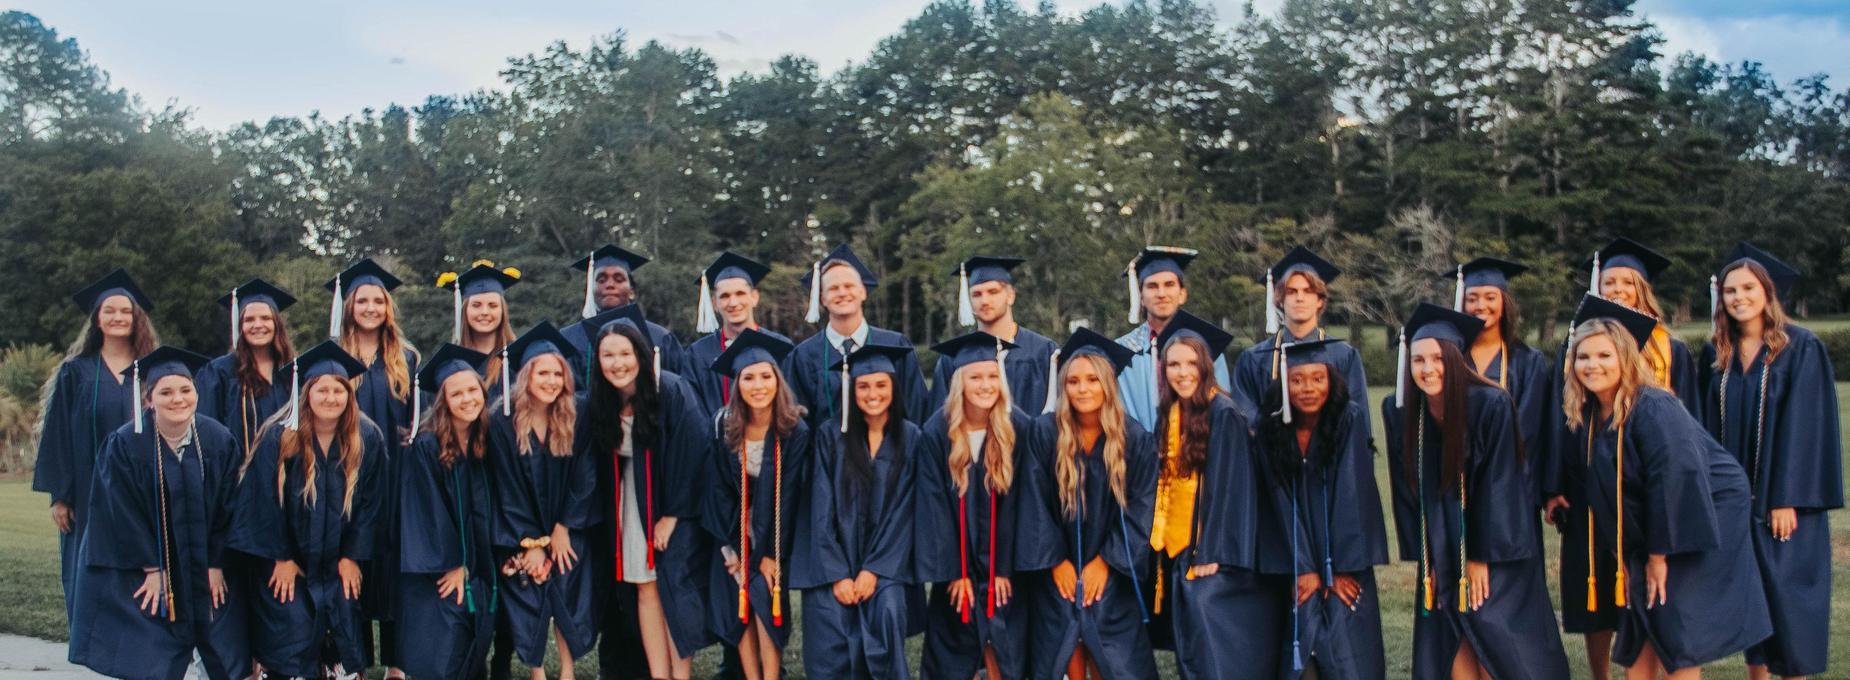 Graduating Class of 2020!